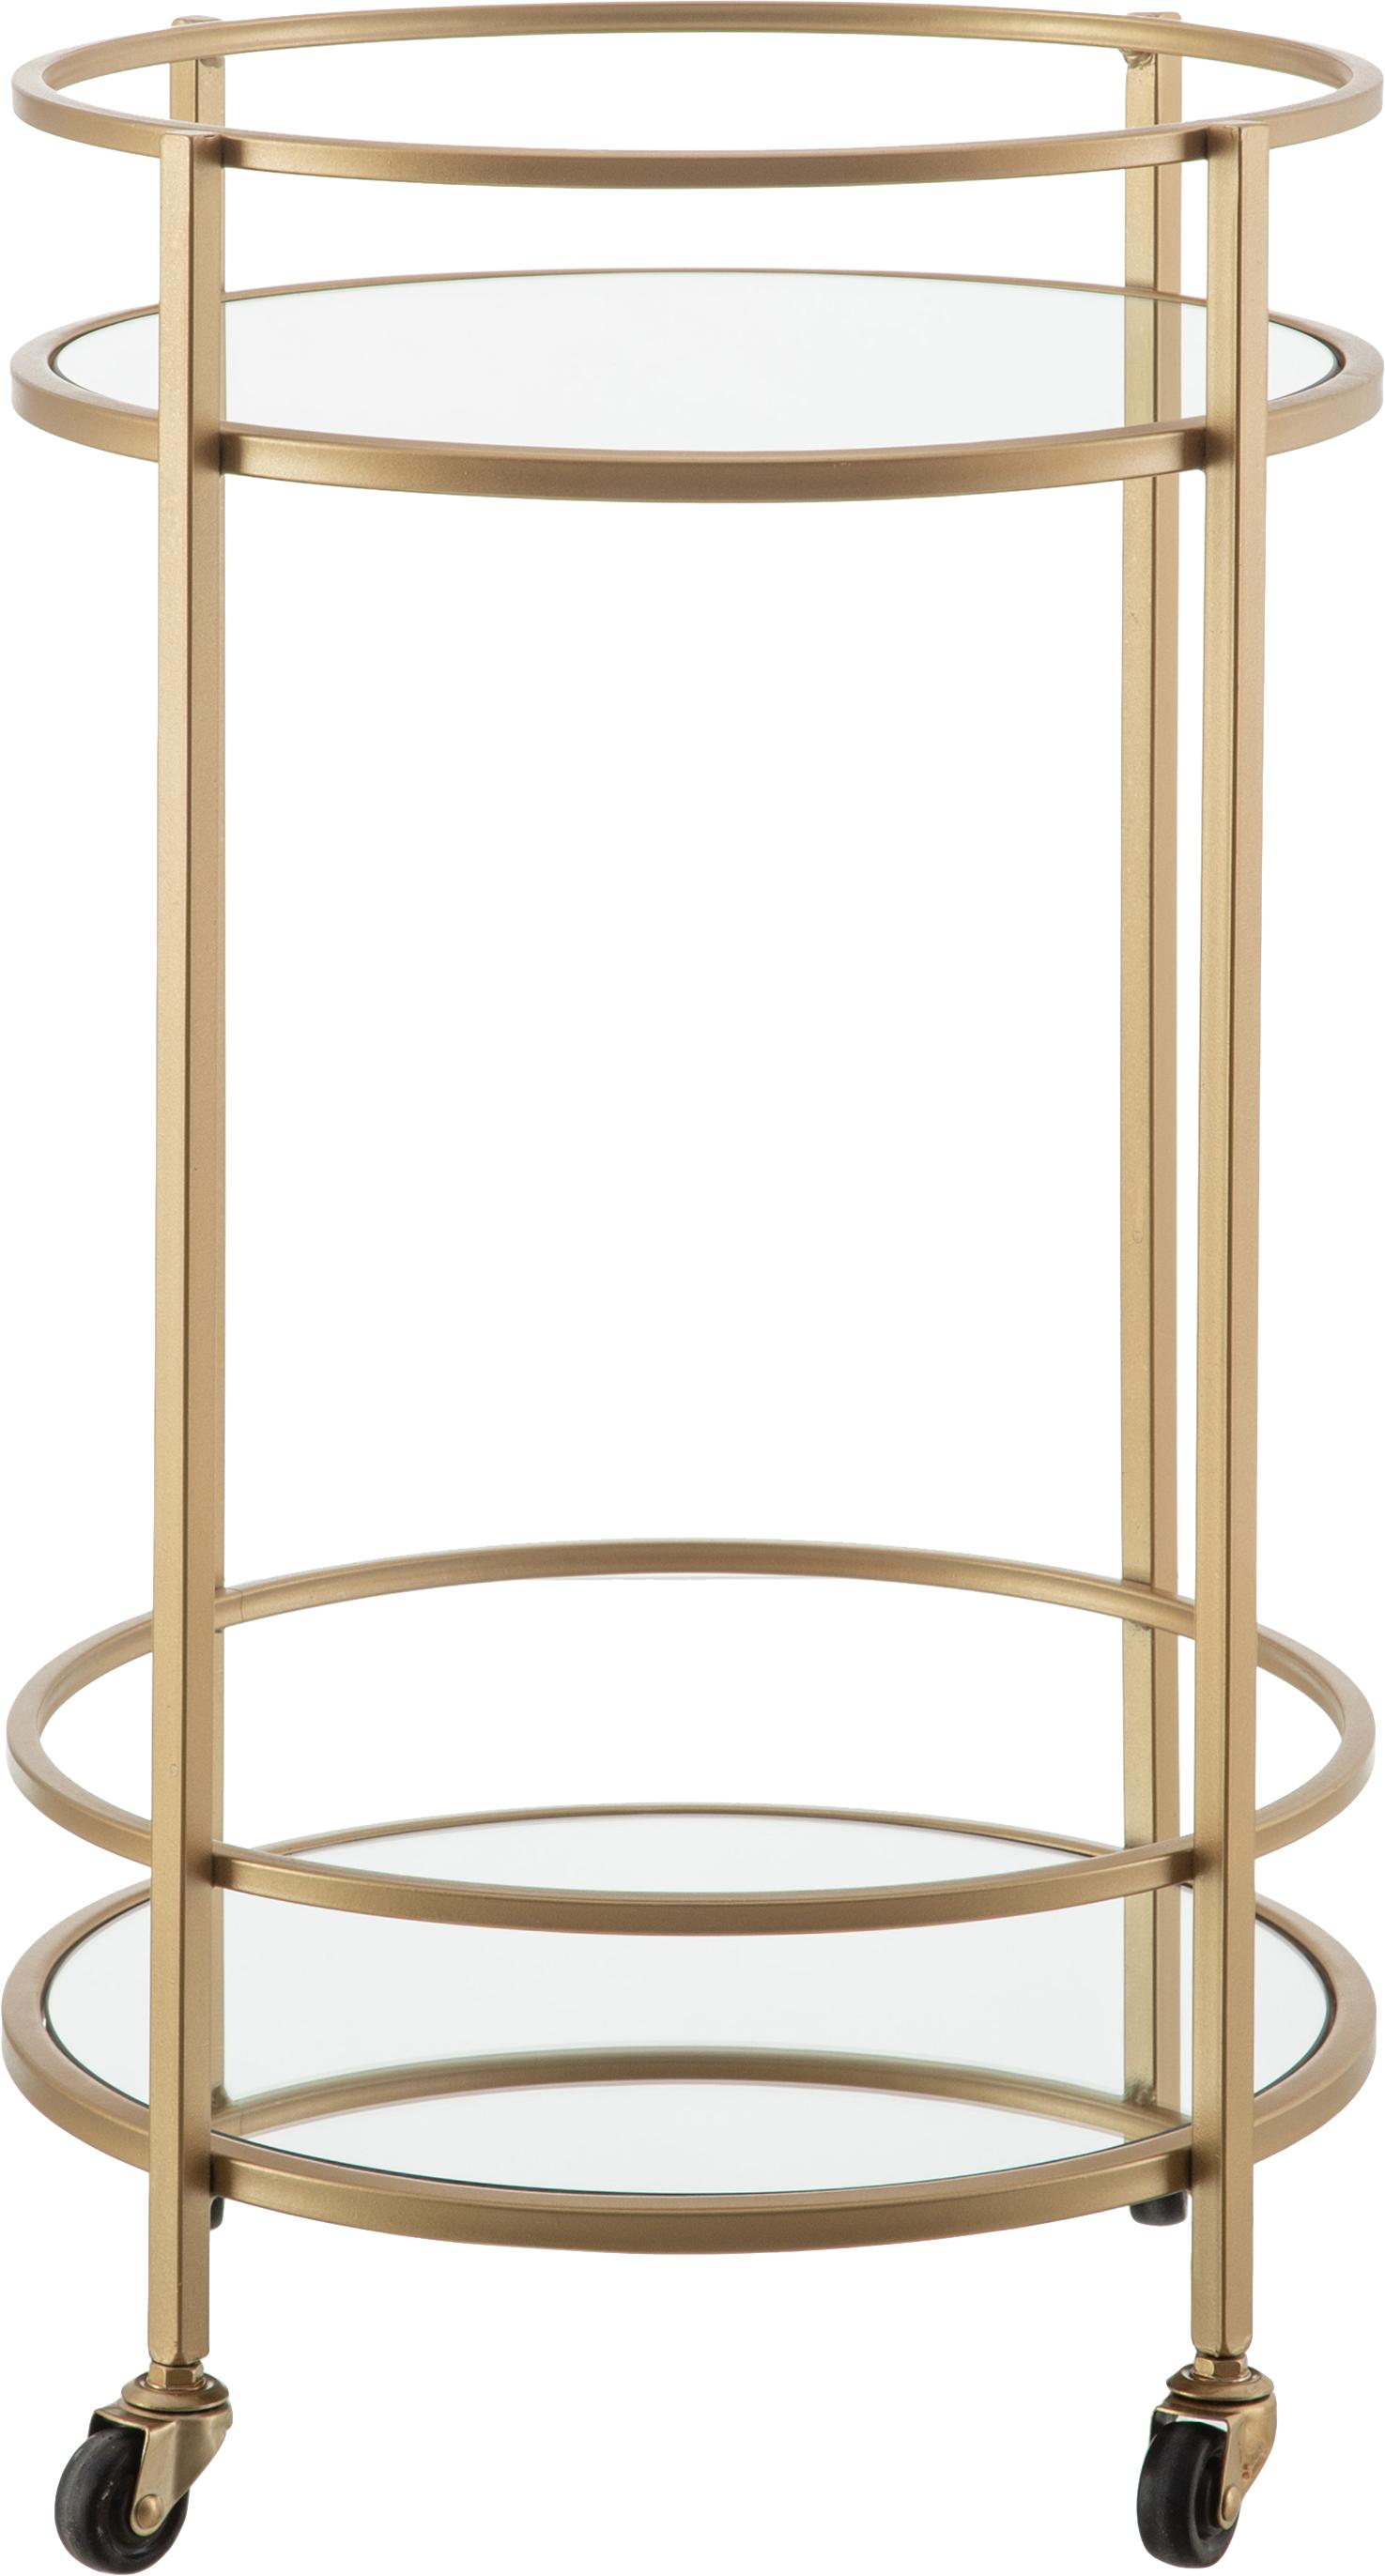 Ronde barcart Camarera goudkleurig, Gelakt metaal Spiegelglas, Messingkleurig, Ø 43 x H 70 cm